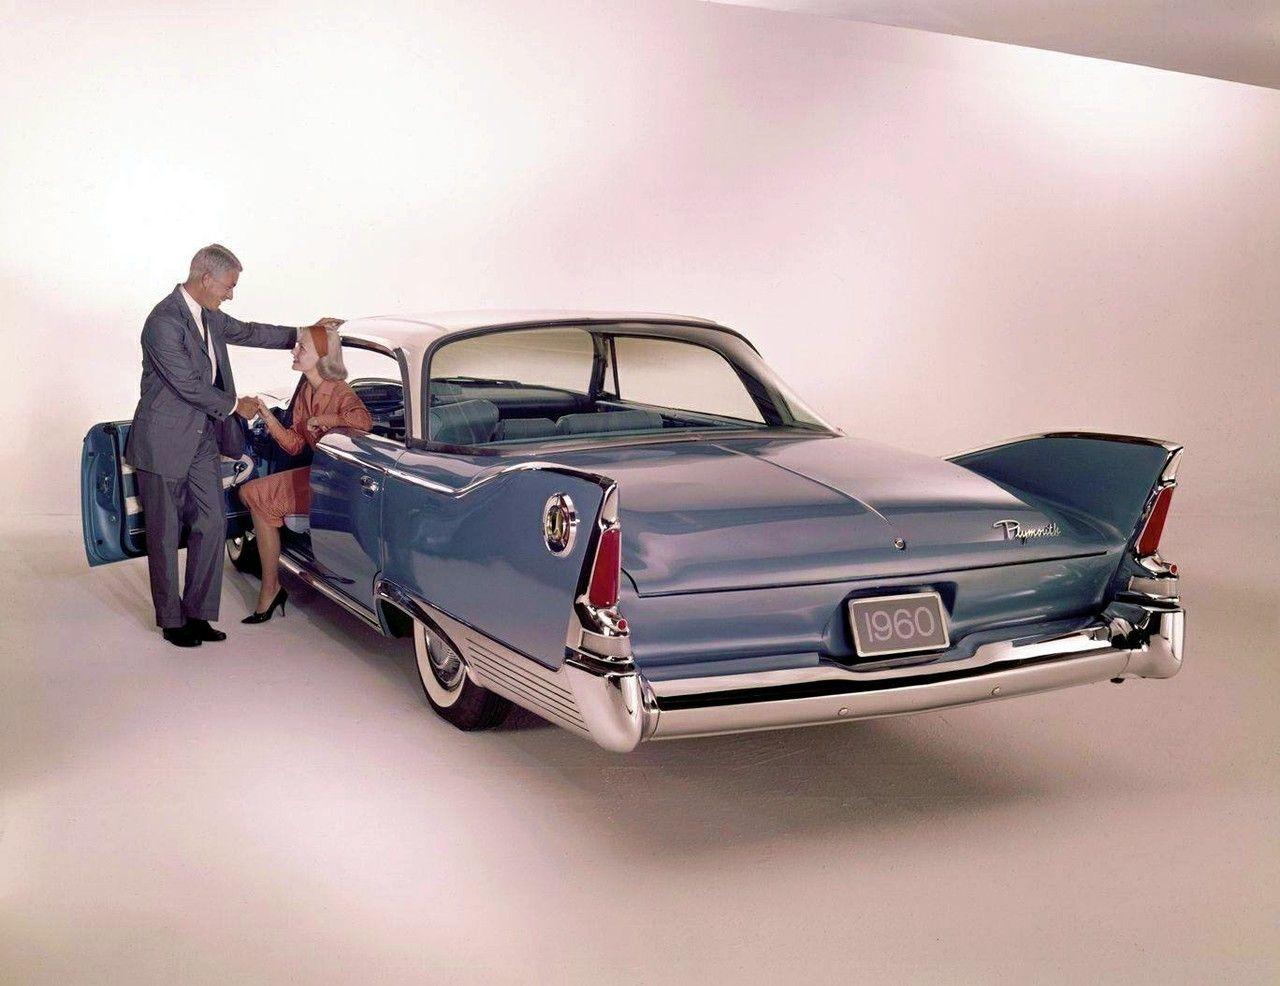 1960 Plymouth Fury Four Door Hardtop Plymouth Fury Autos